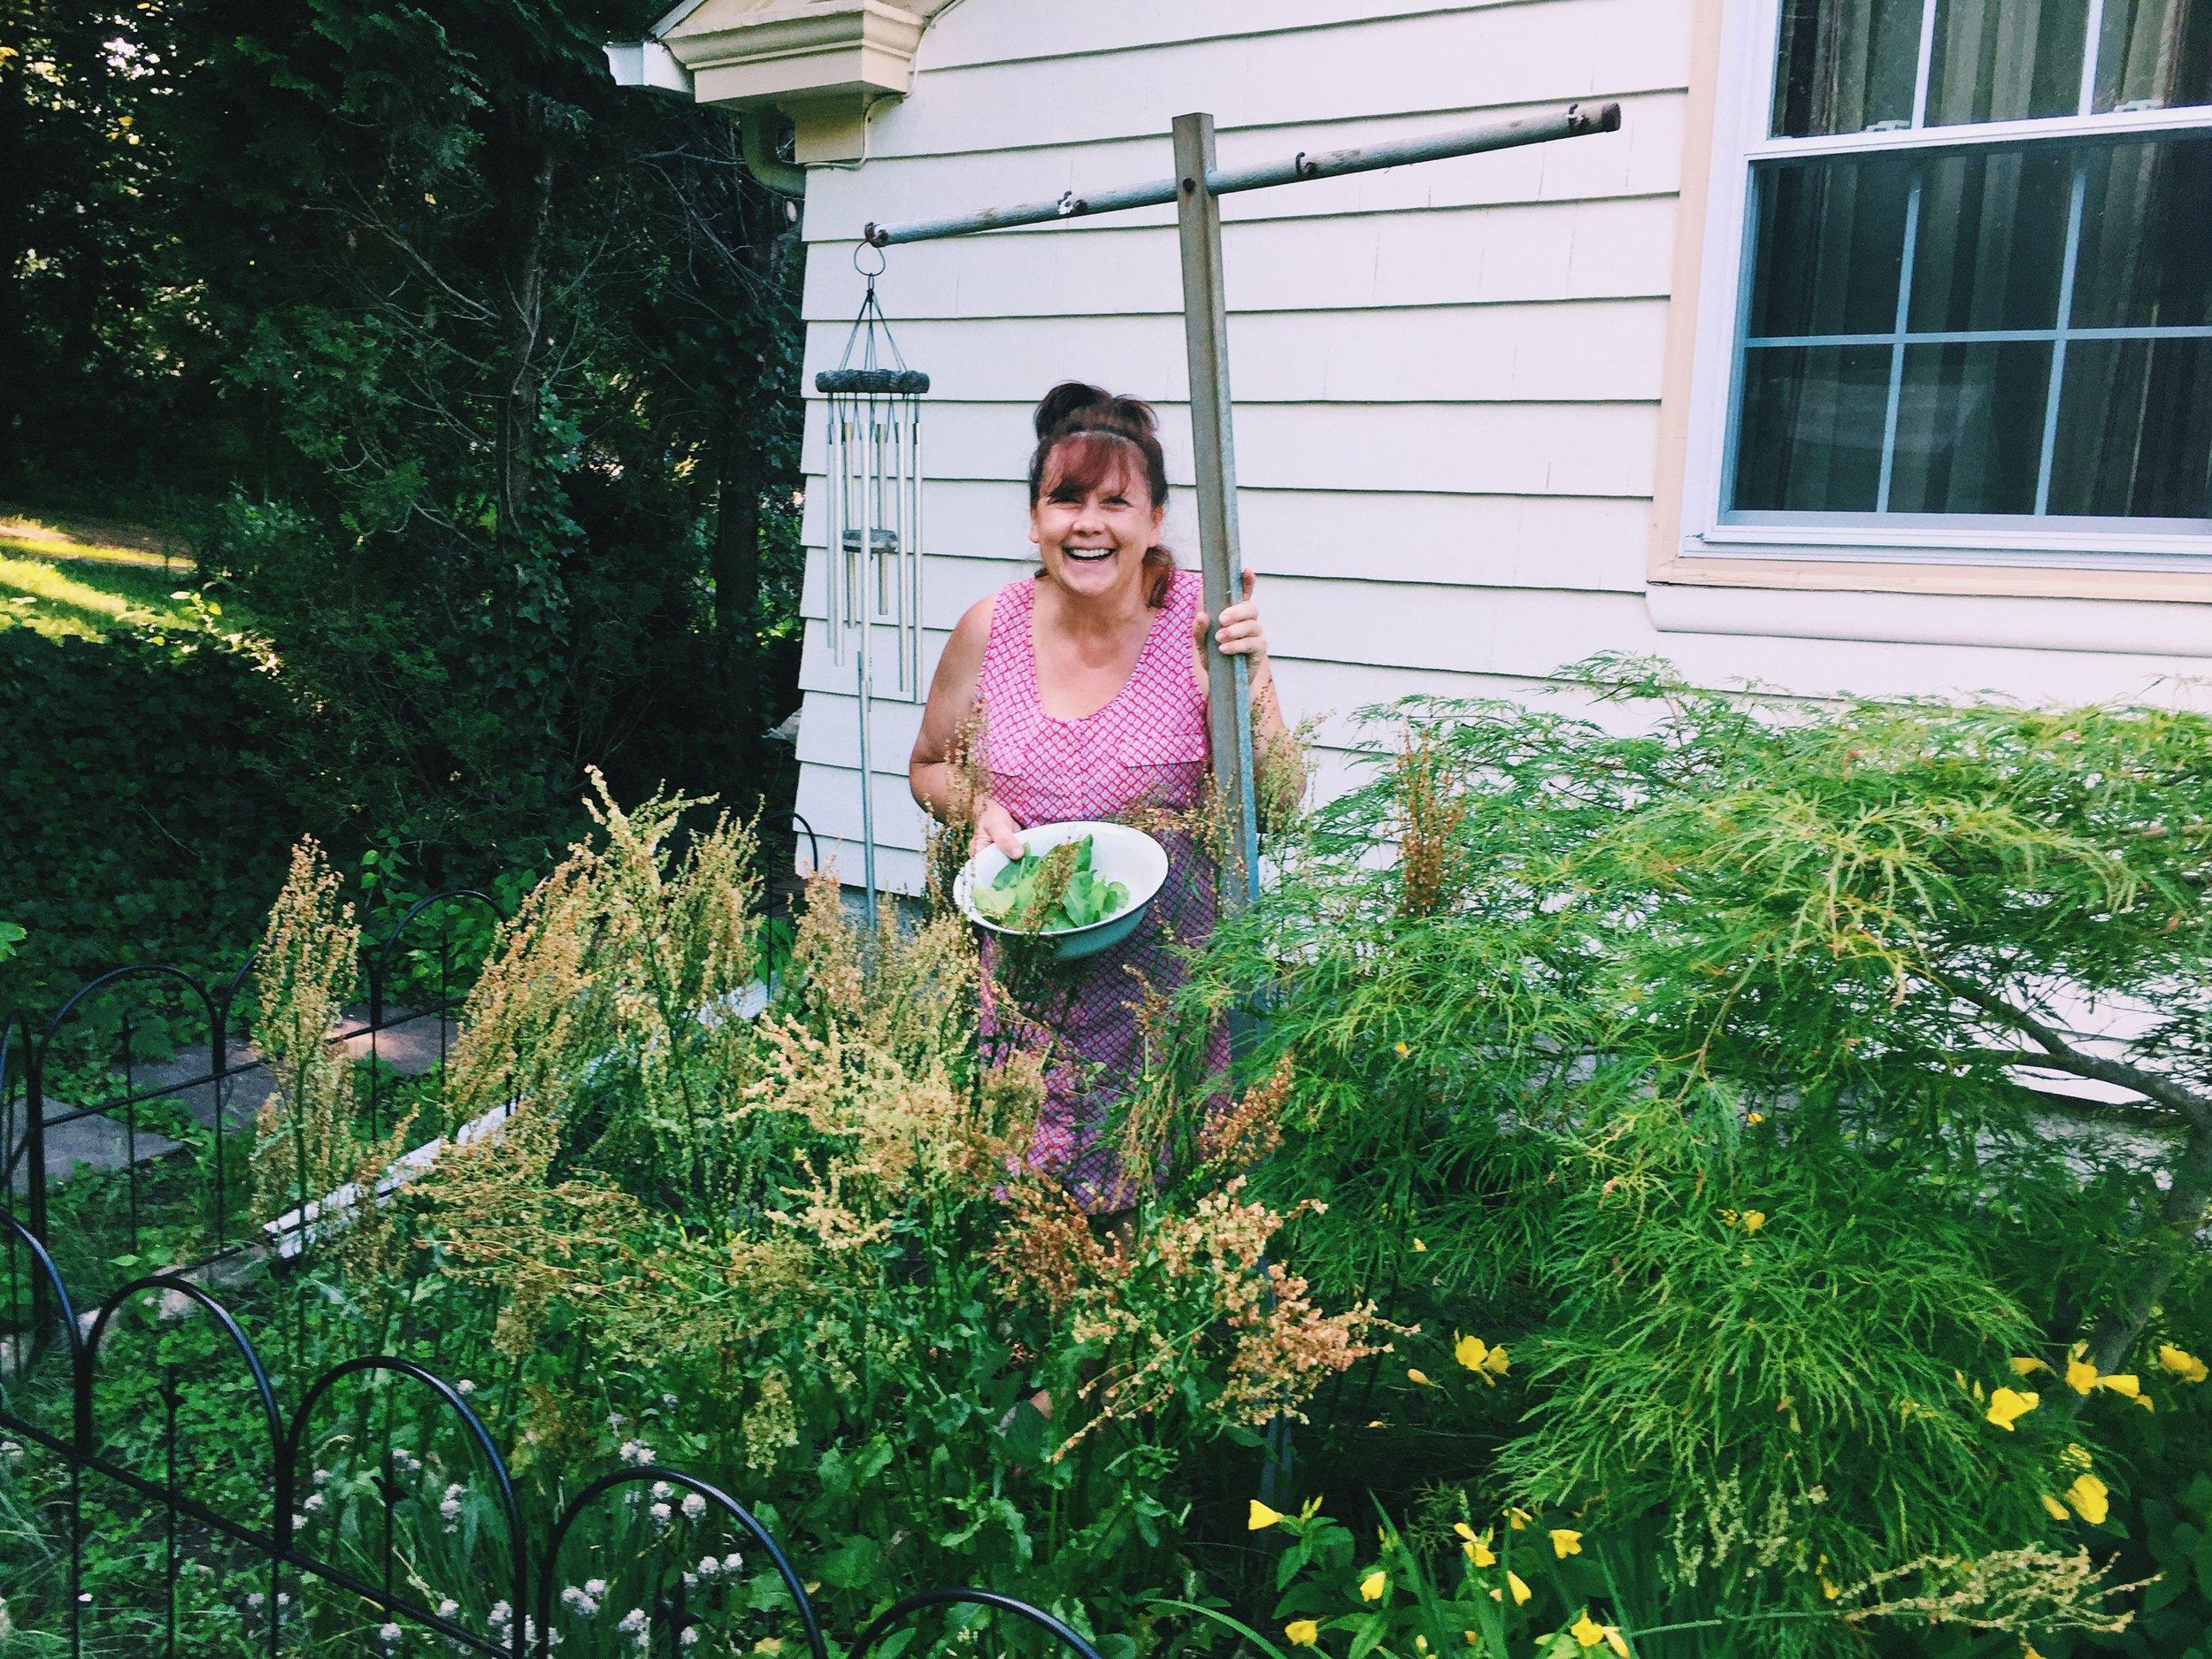 My Aunt Olga picking sorrel from her garden.